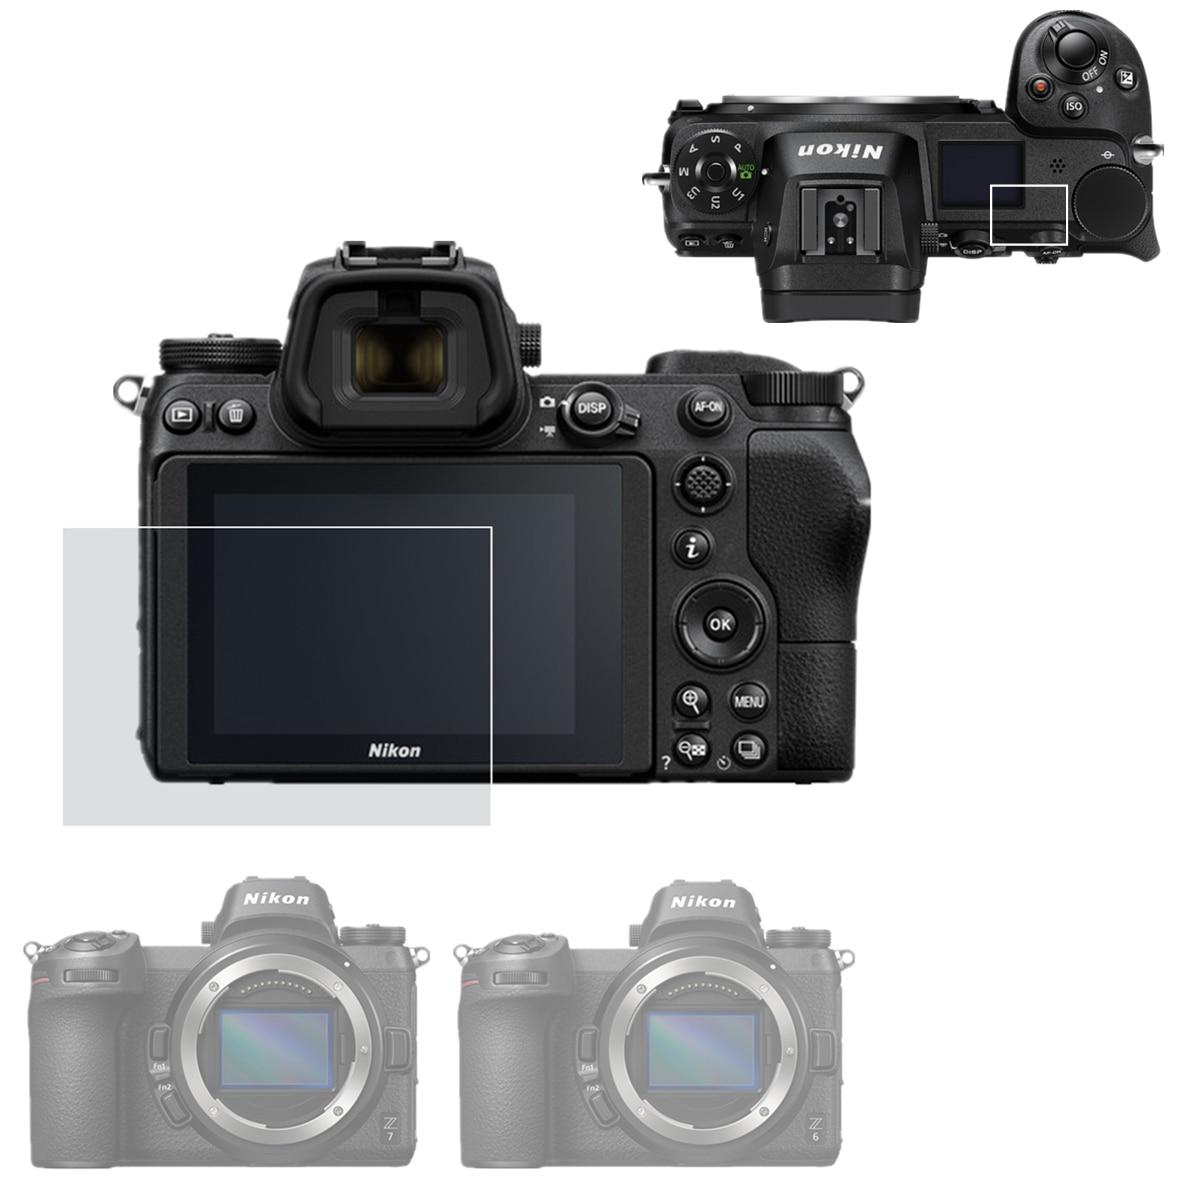 Self-adhesive Main LCD Tempered Glass / Film Screen Protector + Top Shoulder Info Screen Protector For Nikon Z7 Z6 Z 7 6 Camera